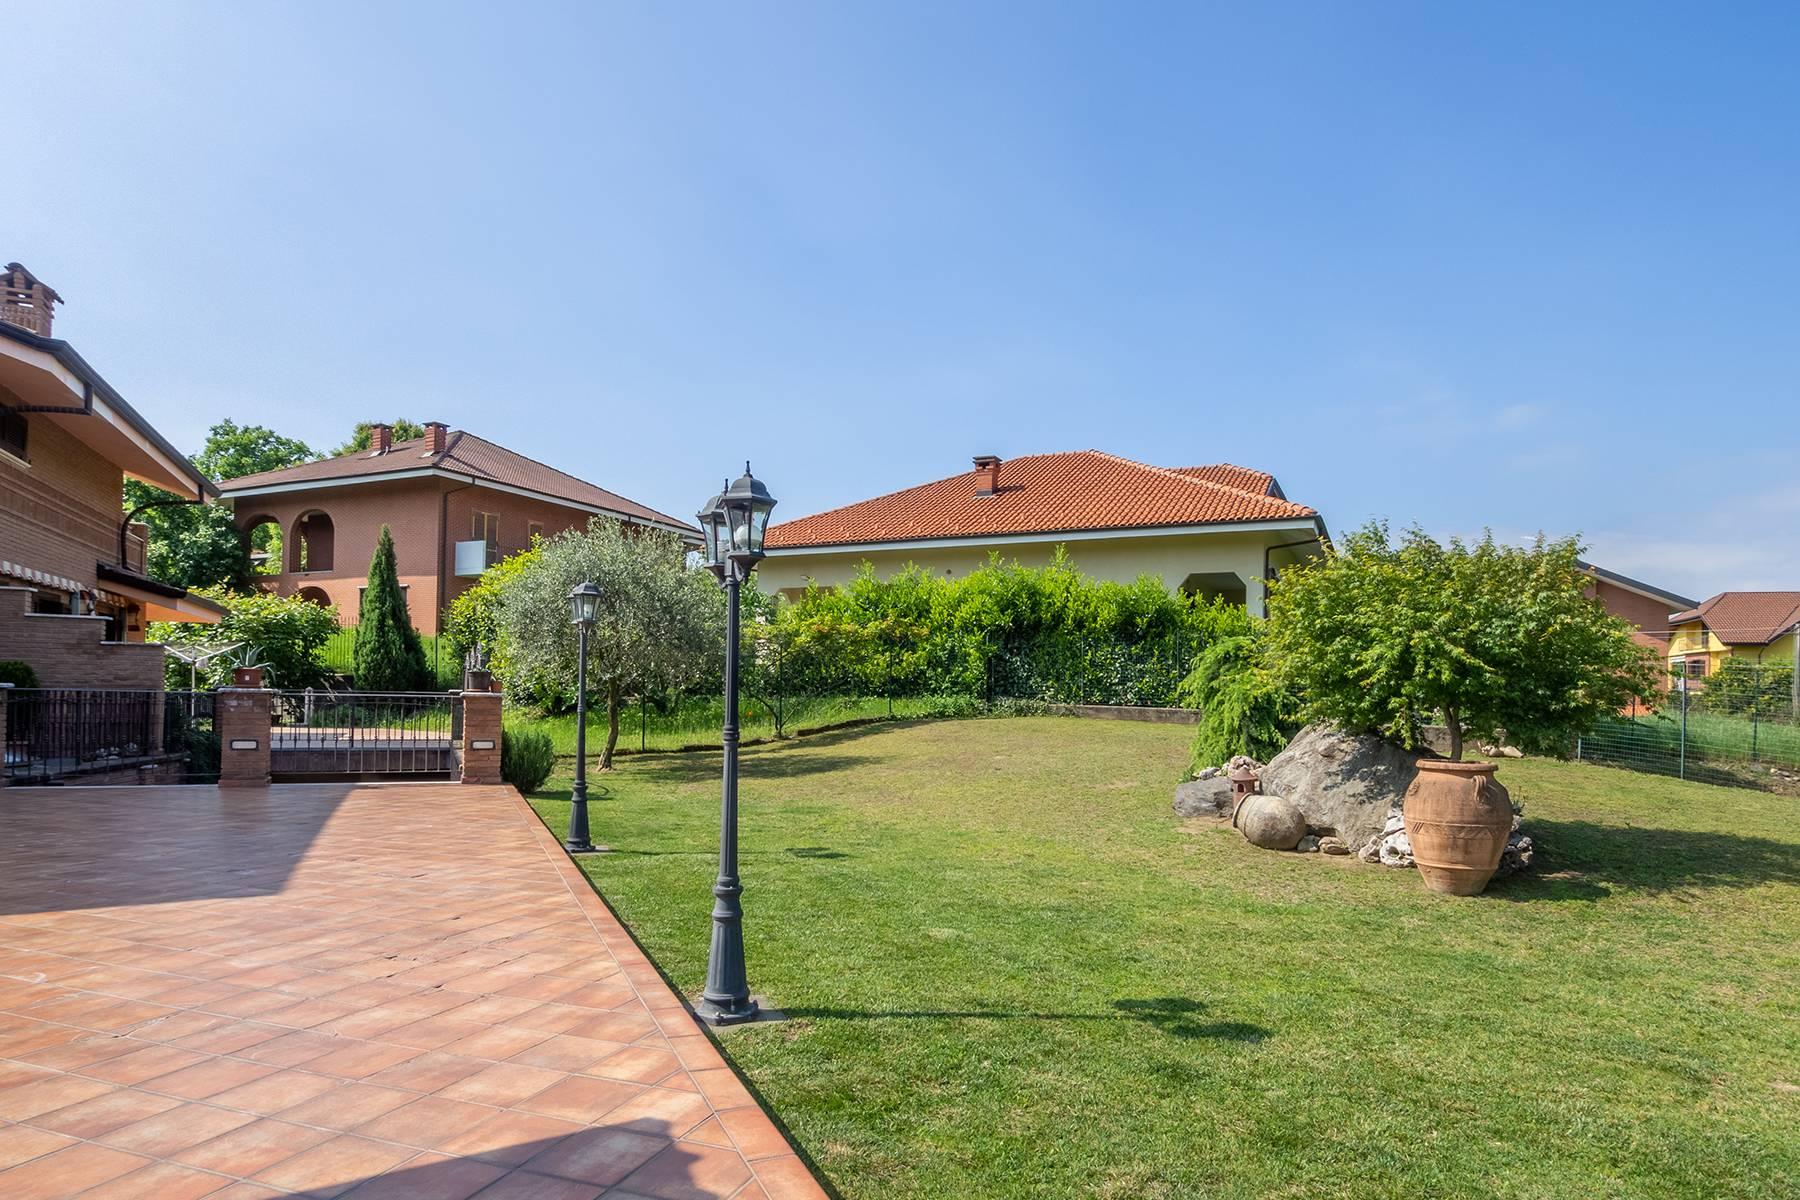 Villa in Vendita a Rosta: 5 locali, 182 mq - Foto 7